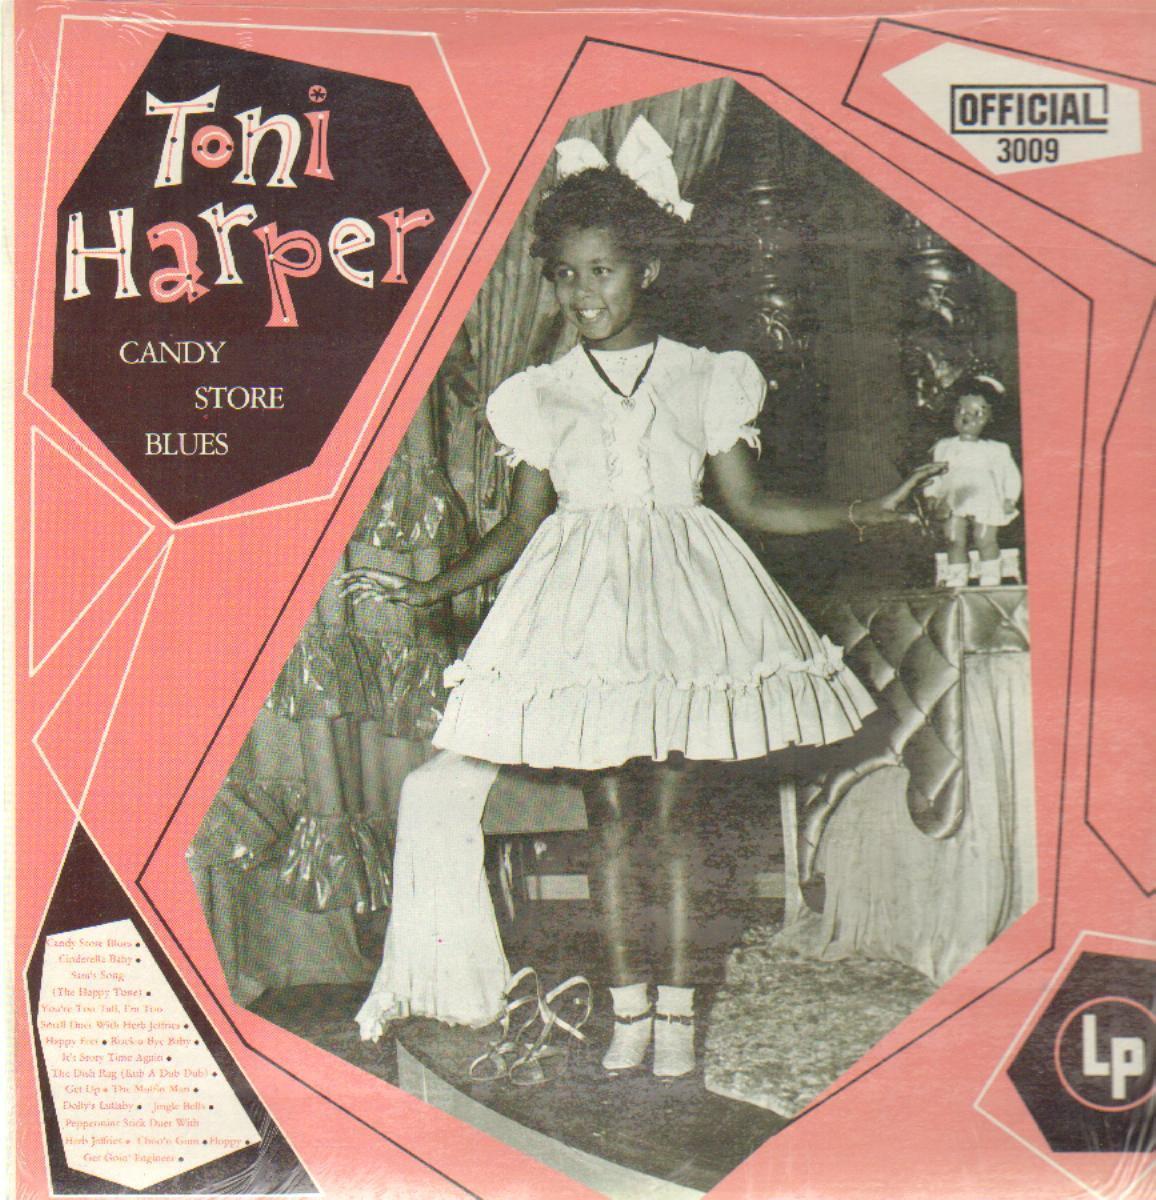 toni_harper-candy_store_blues_